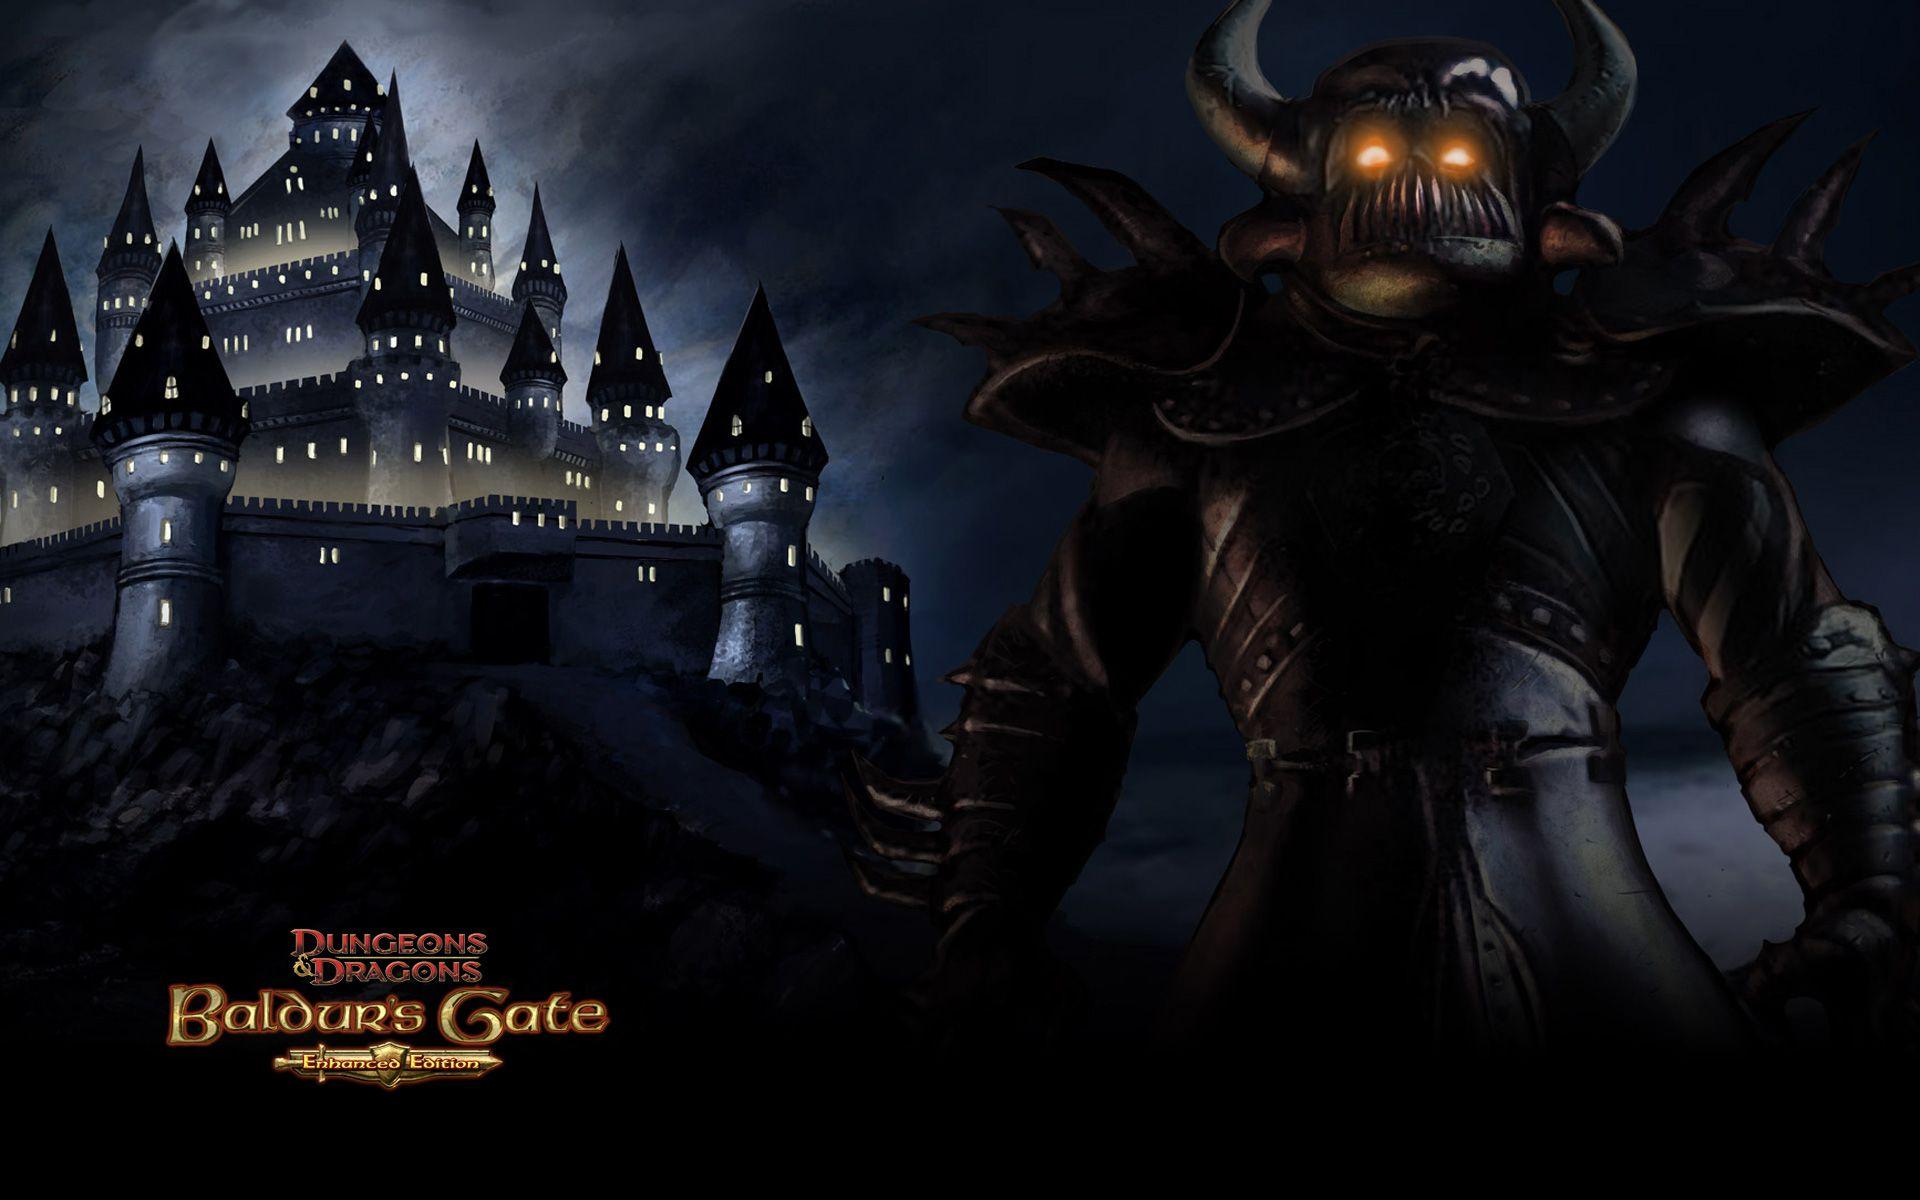 Baldurs Gate Enhanced Edition Sarevok Jpg 1920 1200 Baldur S Gate Dungeons And Dragons Love Wallpaper